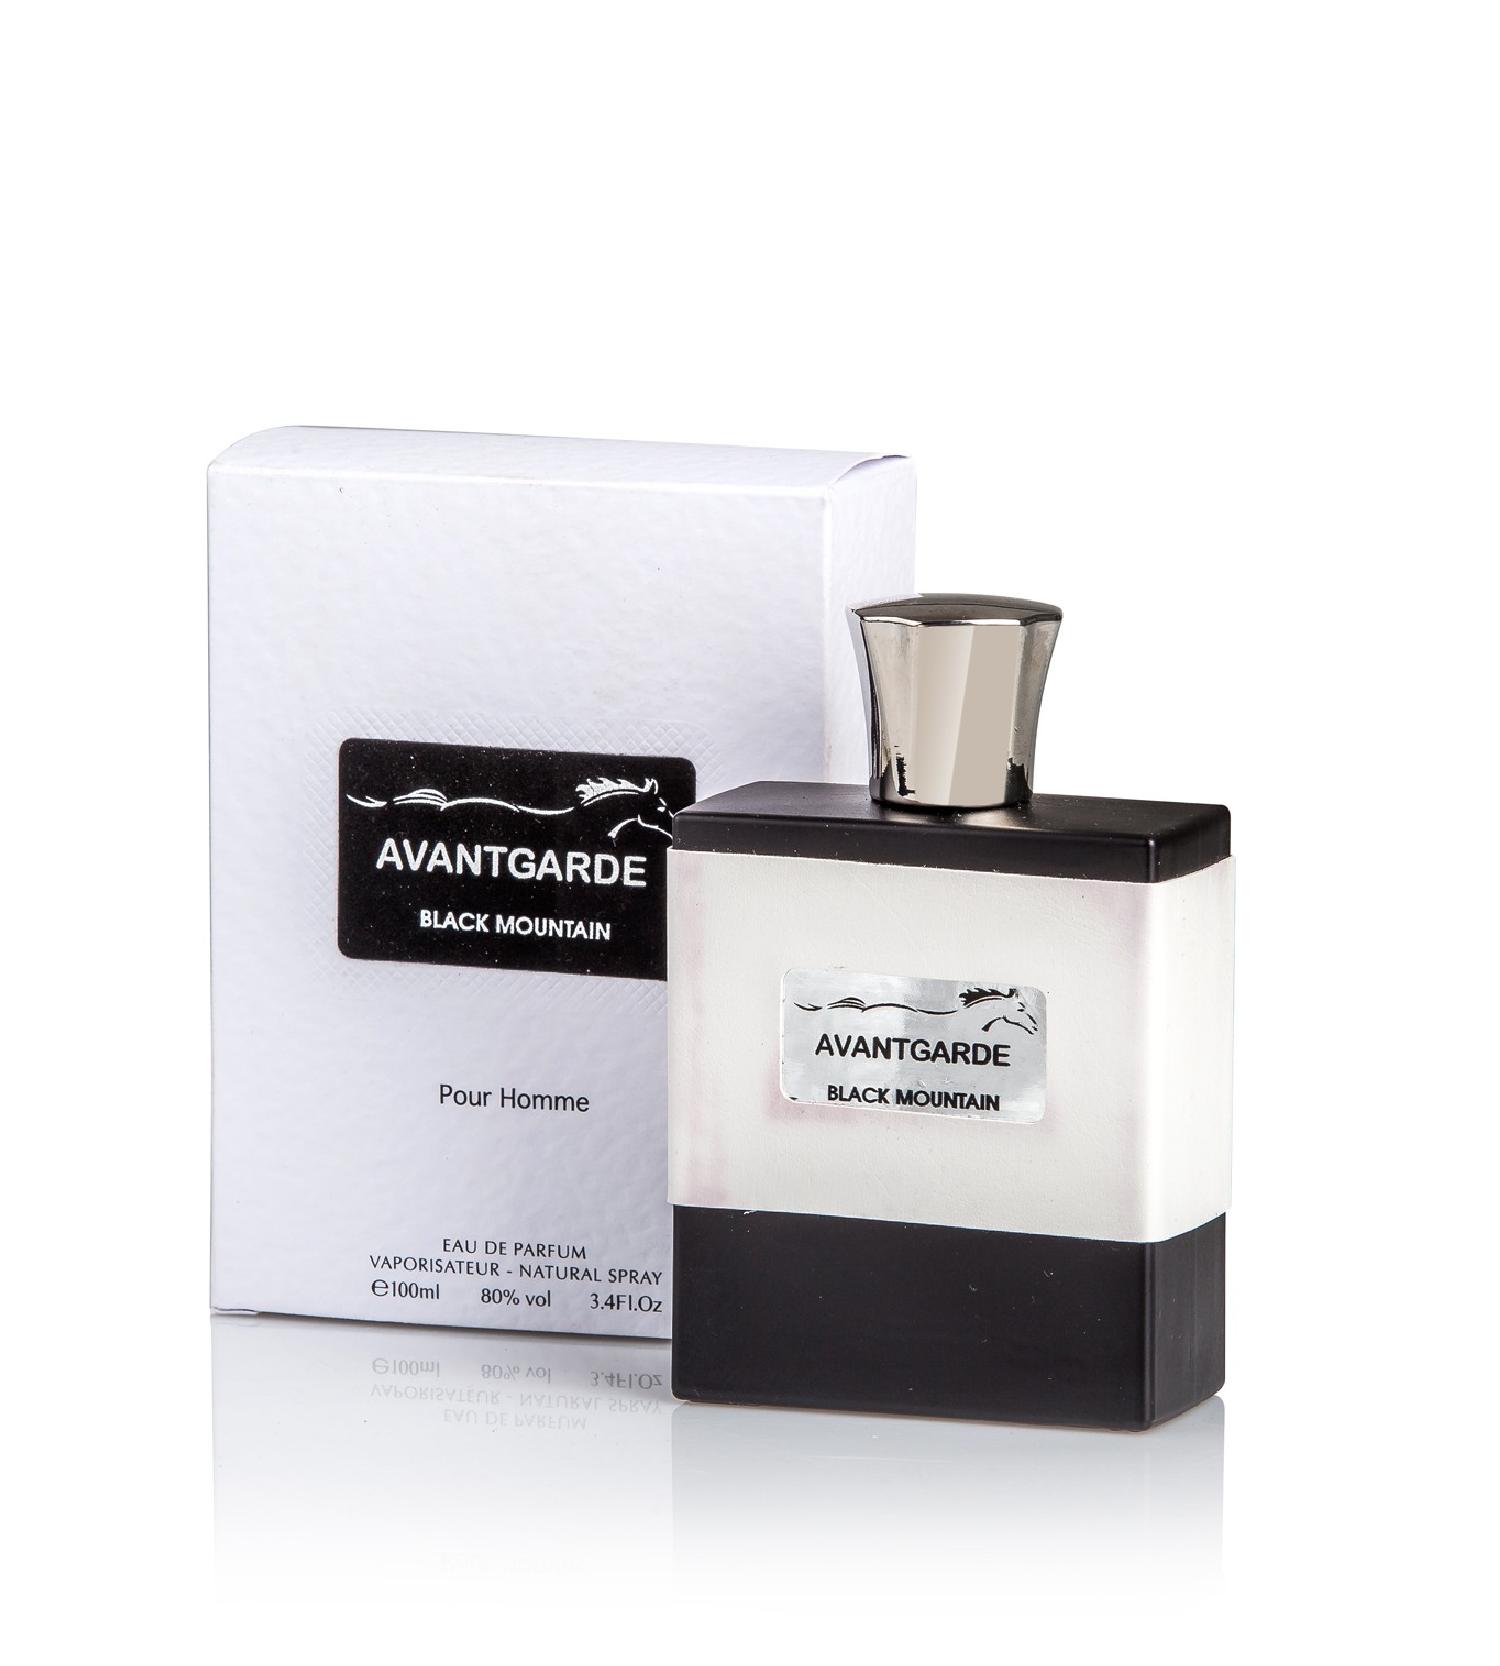 Avantgarde Black Mountain EdP pro muže vzorek